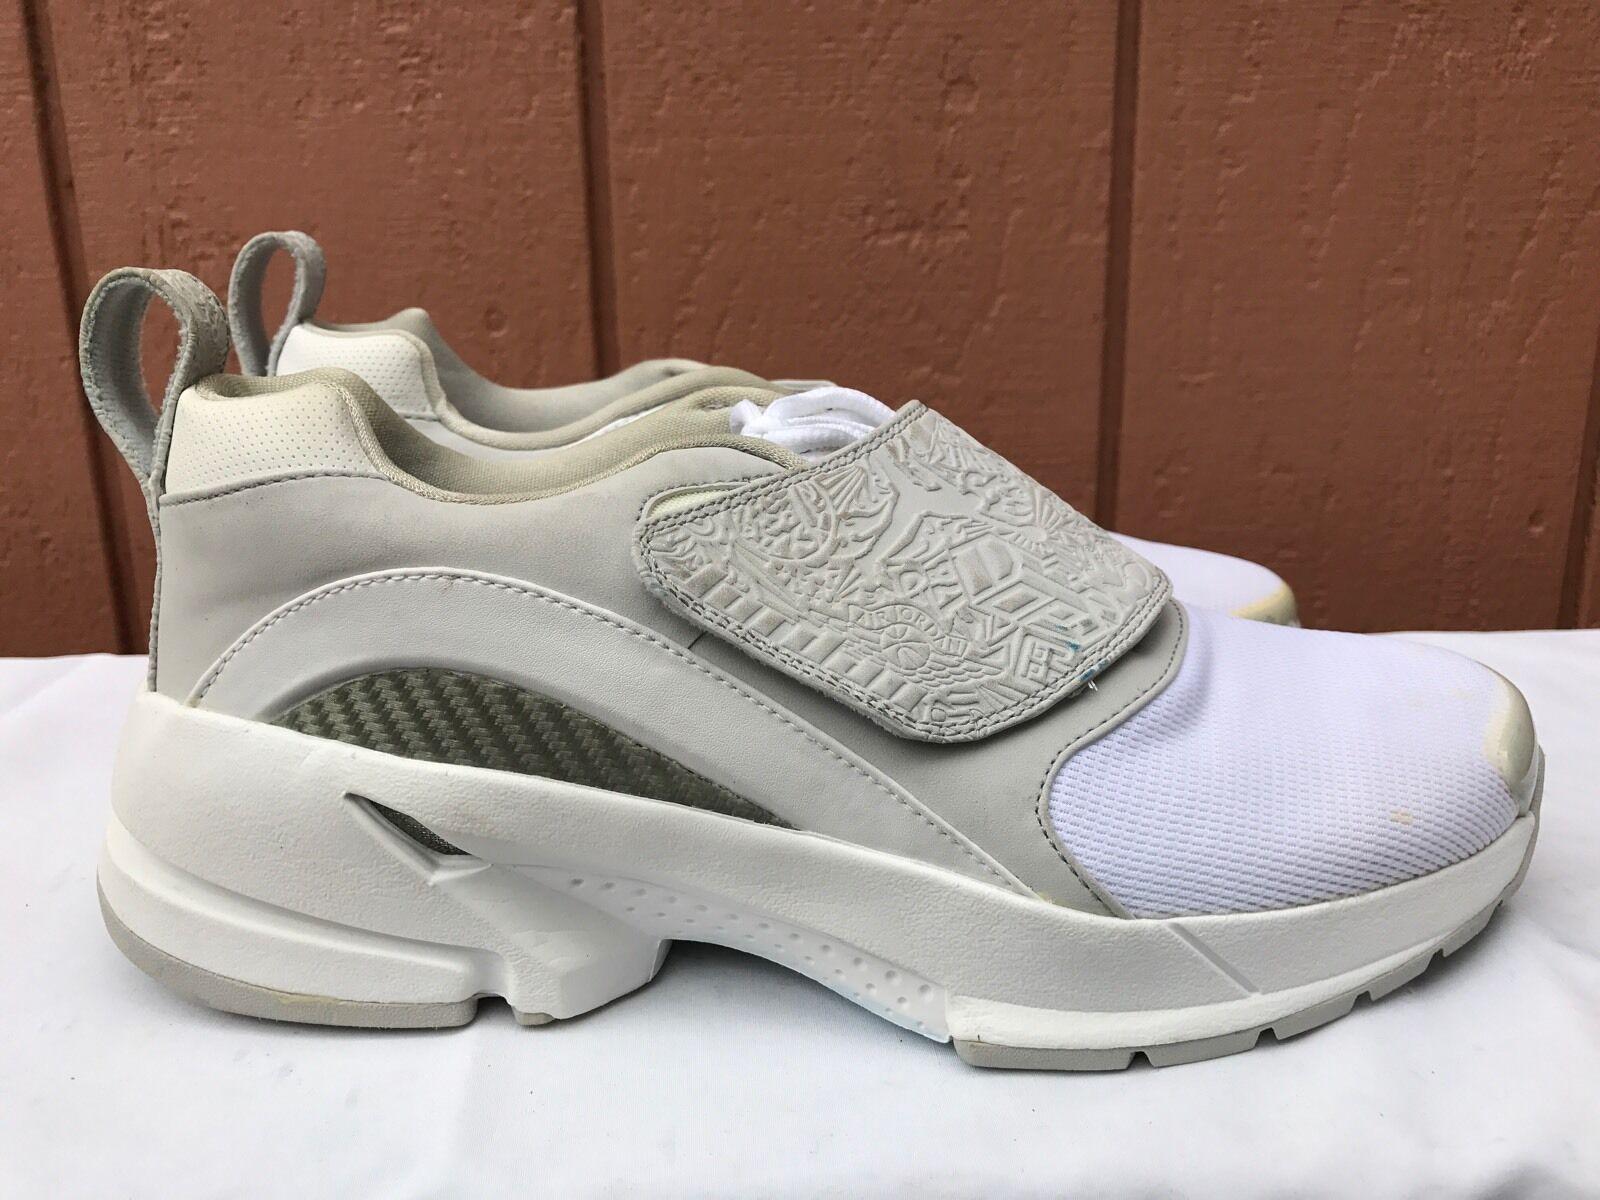 Men's Nike Air Jordan XX  Trainers 310145 162 White  Shoes Sneakers US 8.5